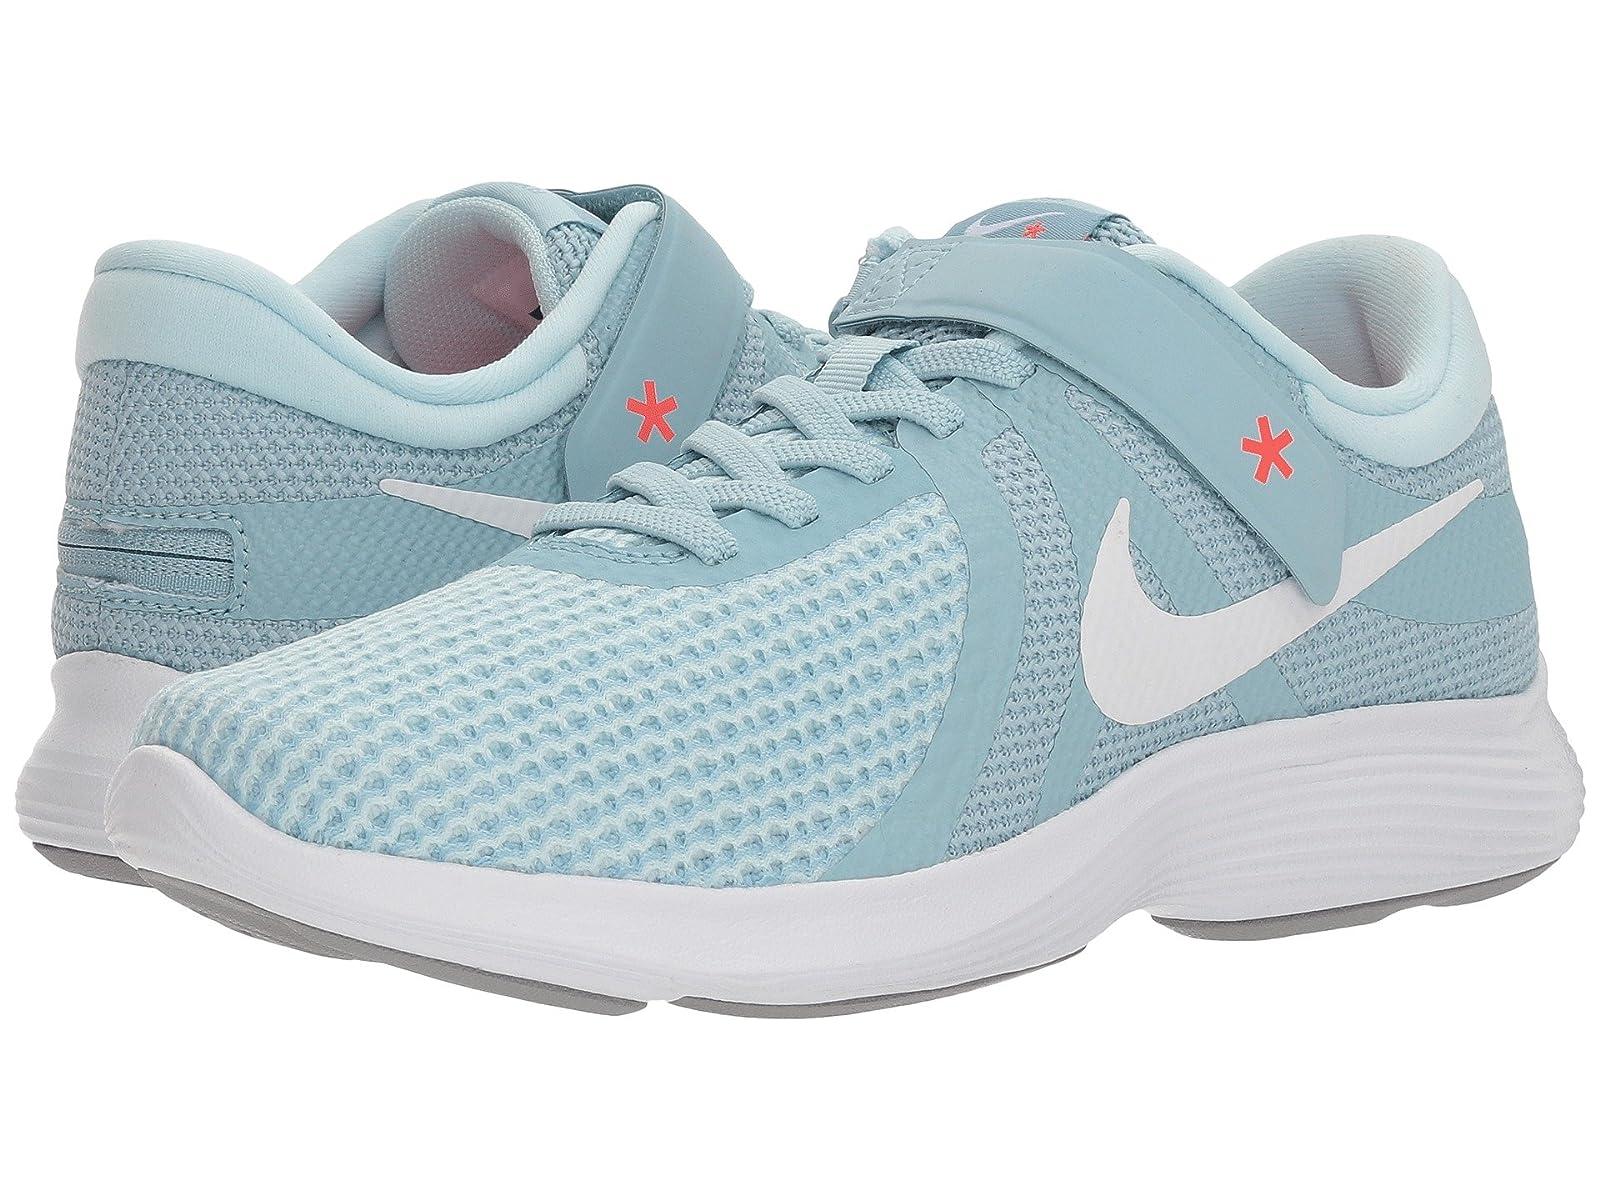 Nike Revolution 4 FlyEaseAtmospheric grades have affordable shoes